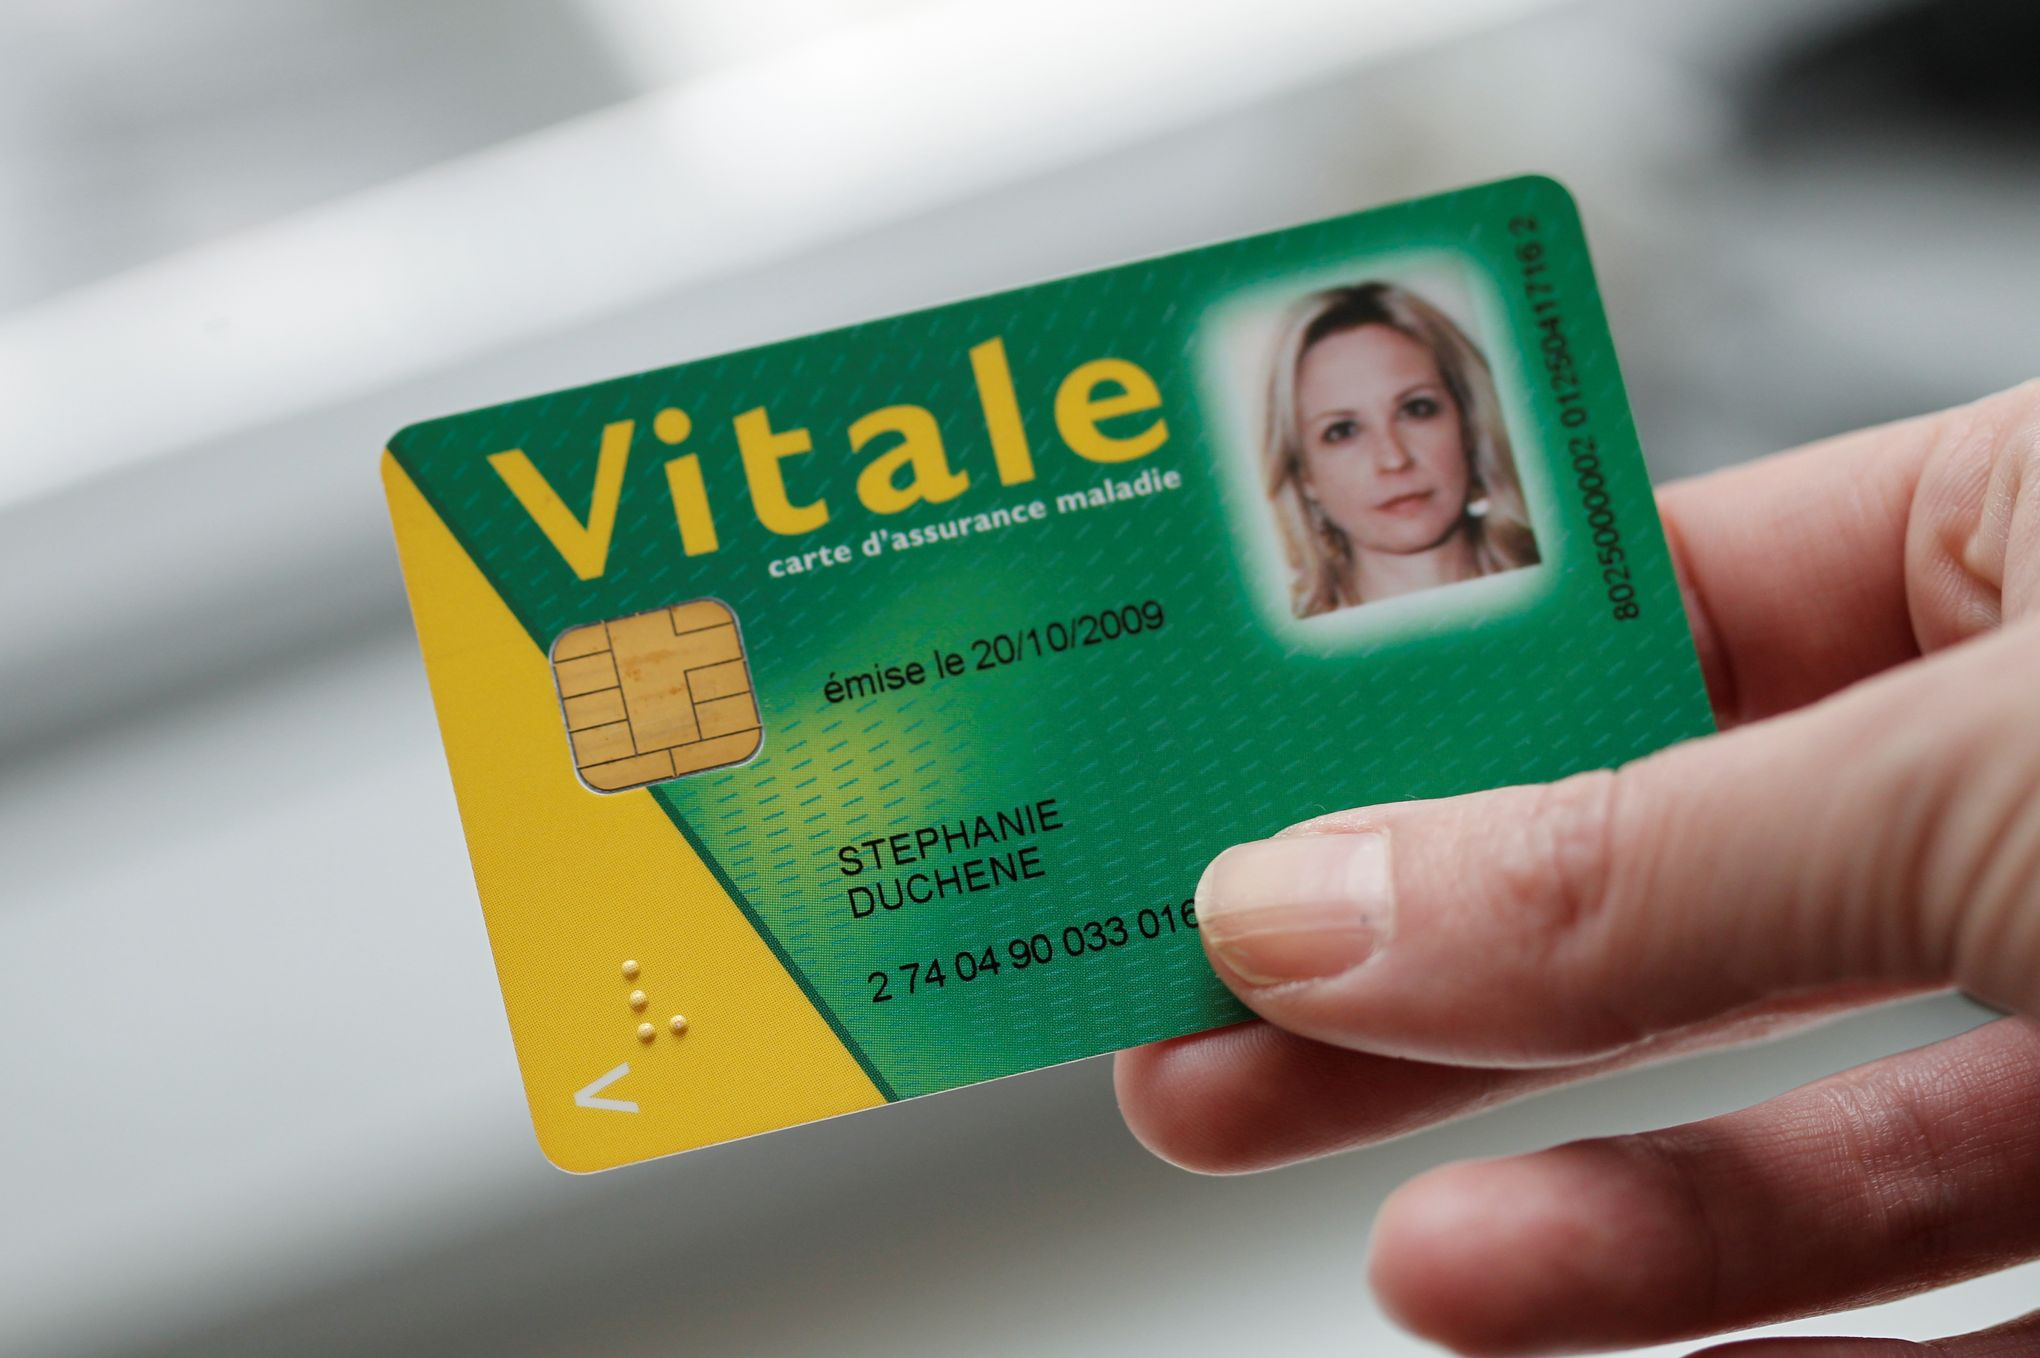 Carte Vitale Photo.Arnaque A La Carte Vitale L Assurance Maladie Met En Garde